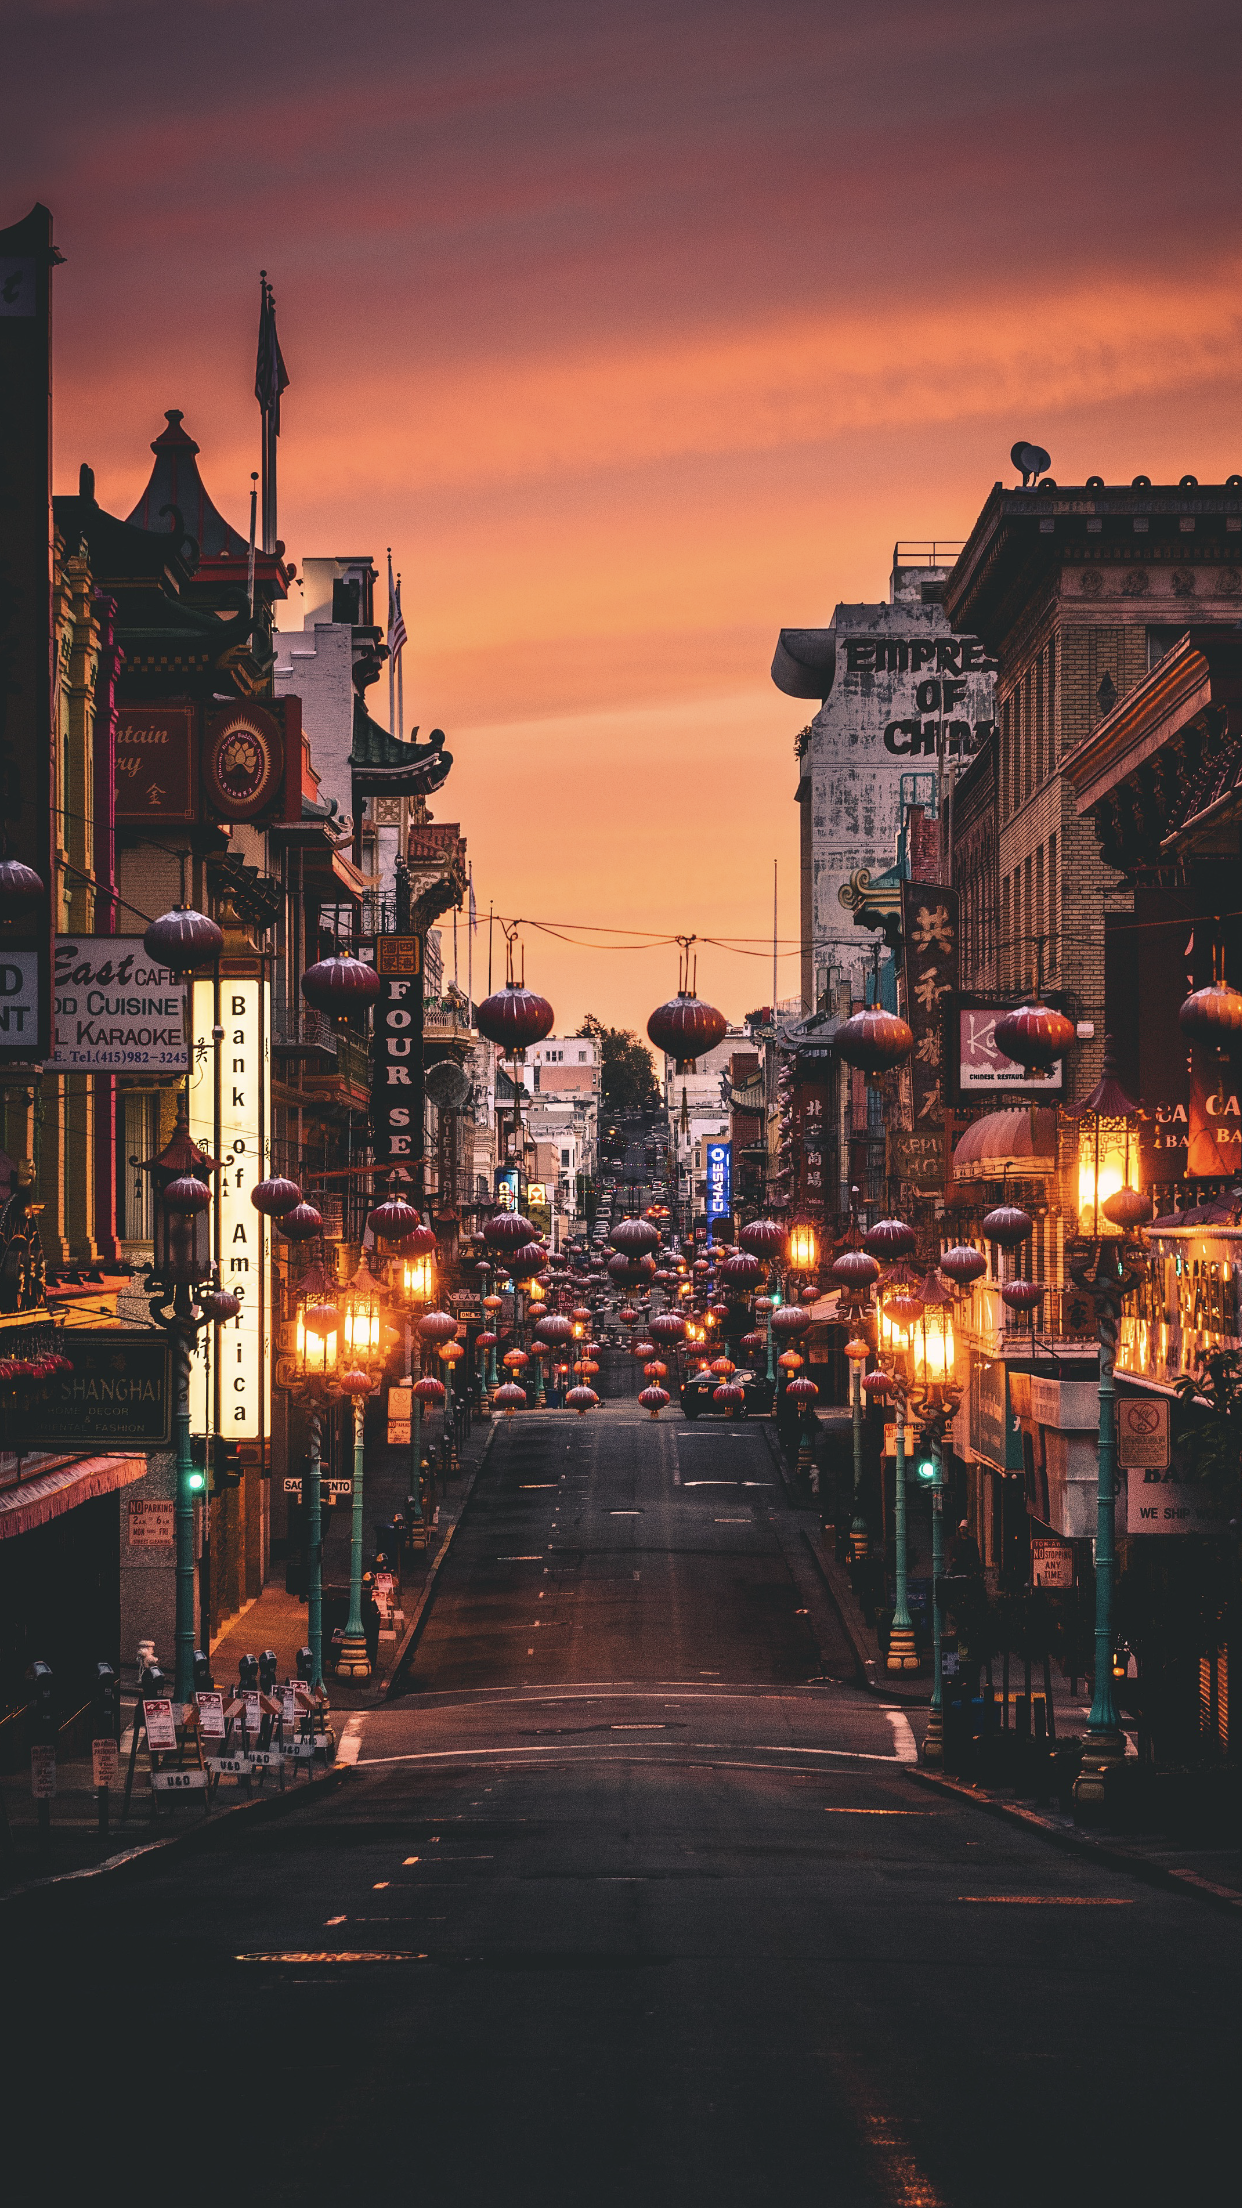 Chinatown Sunrise San Francisco California San Francisco At Night San Francisco Travel Guide Nature Travel Adventure